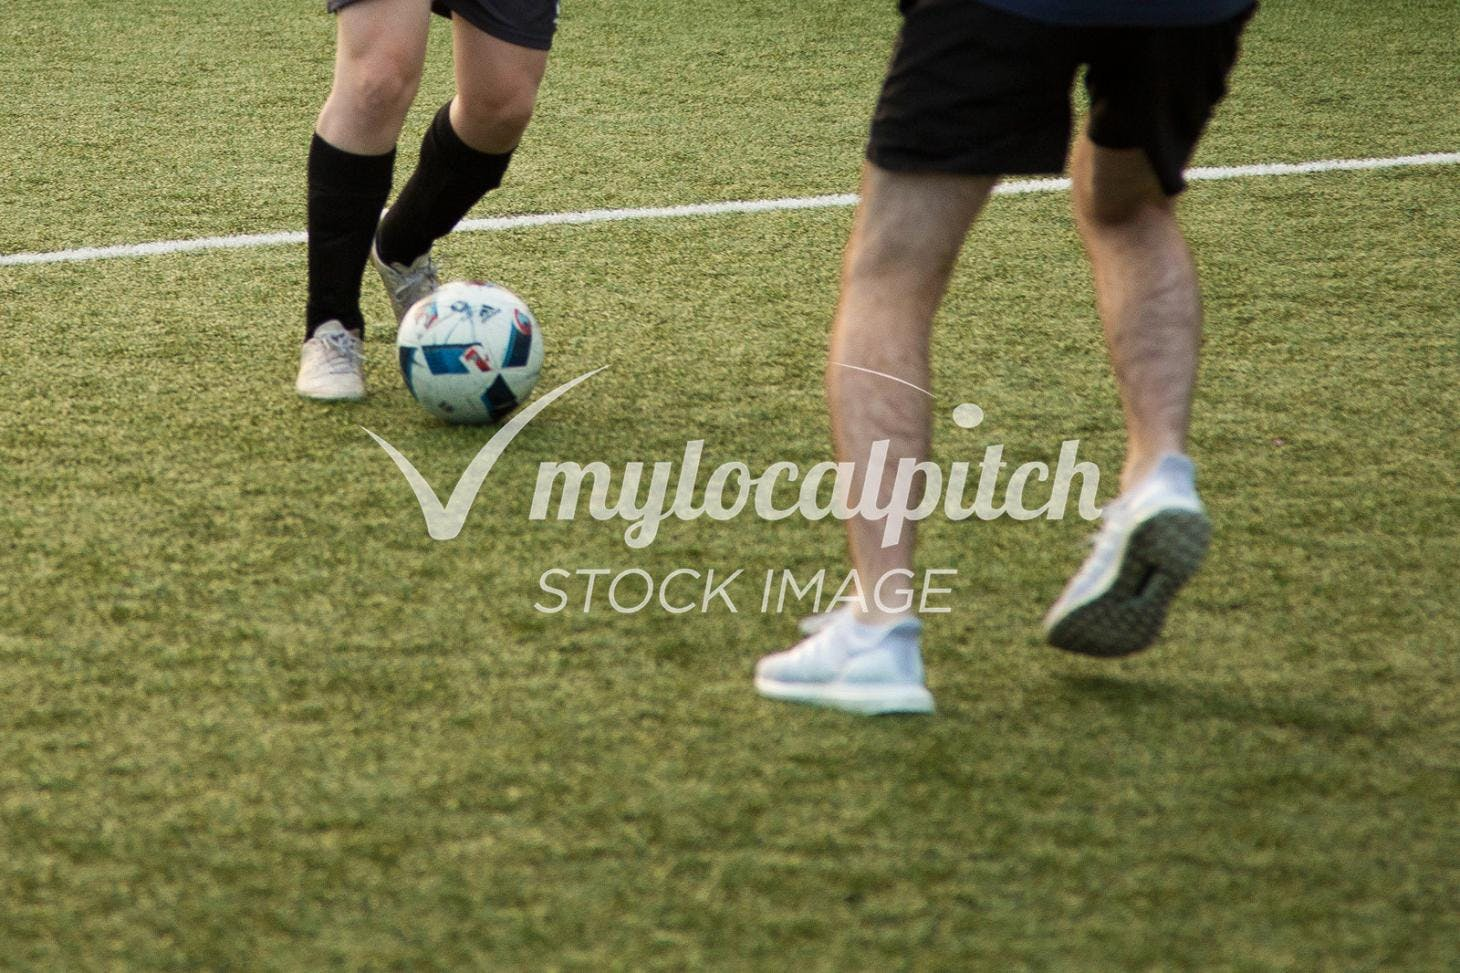 Highlands School 5 a side | Astroturf football pitch